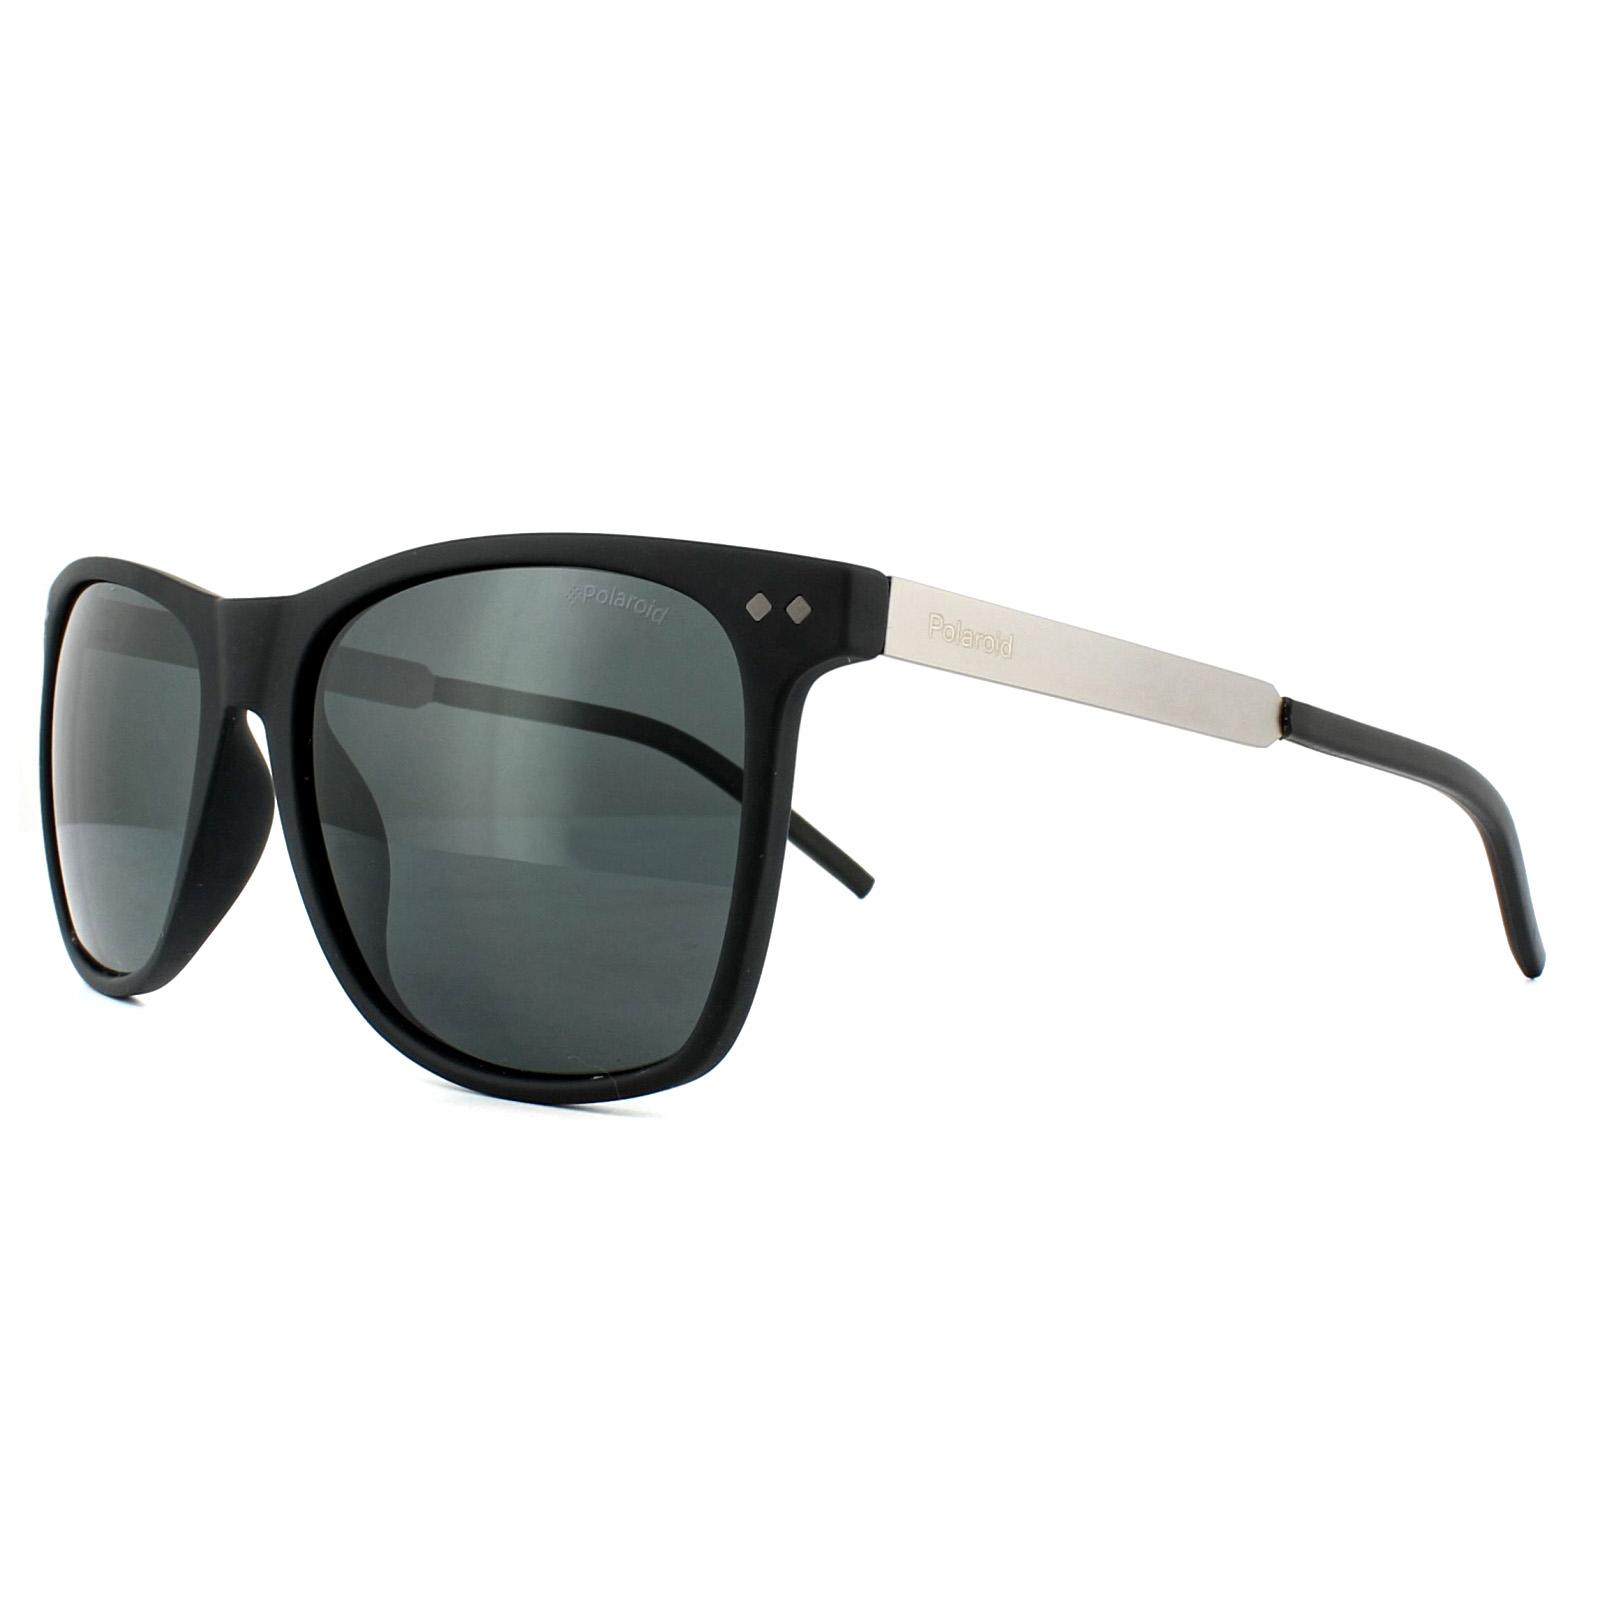 Sentinel Polaroid Sunglasses PLD 1028 S 003 M9 Matt Black Grey Polarized c268b697908c